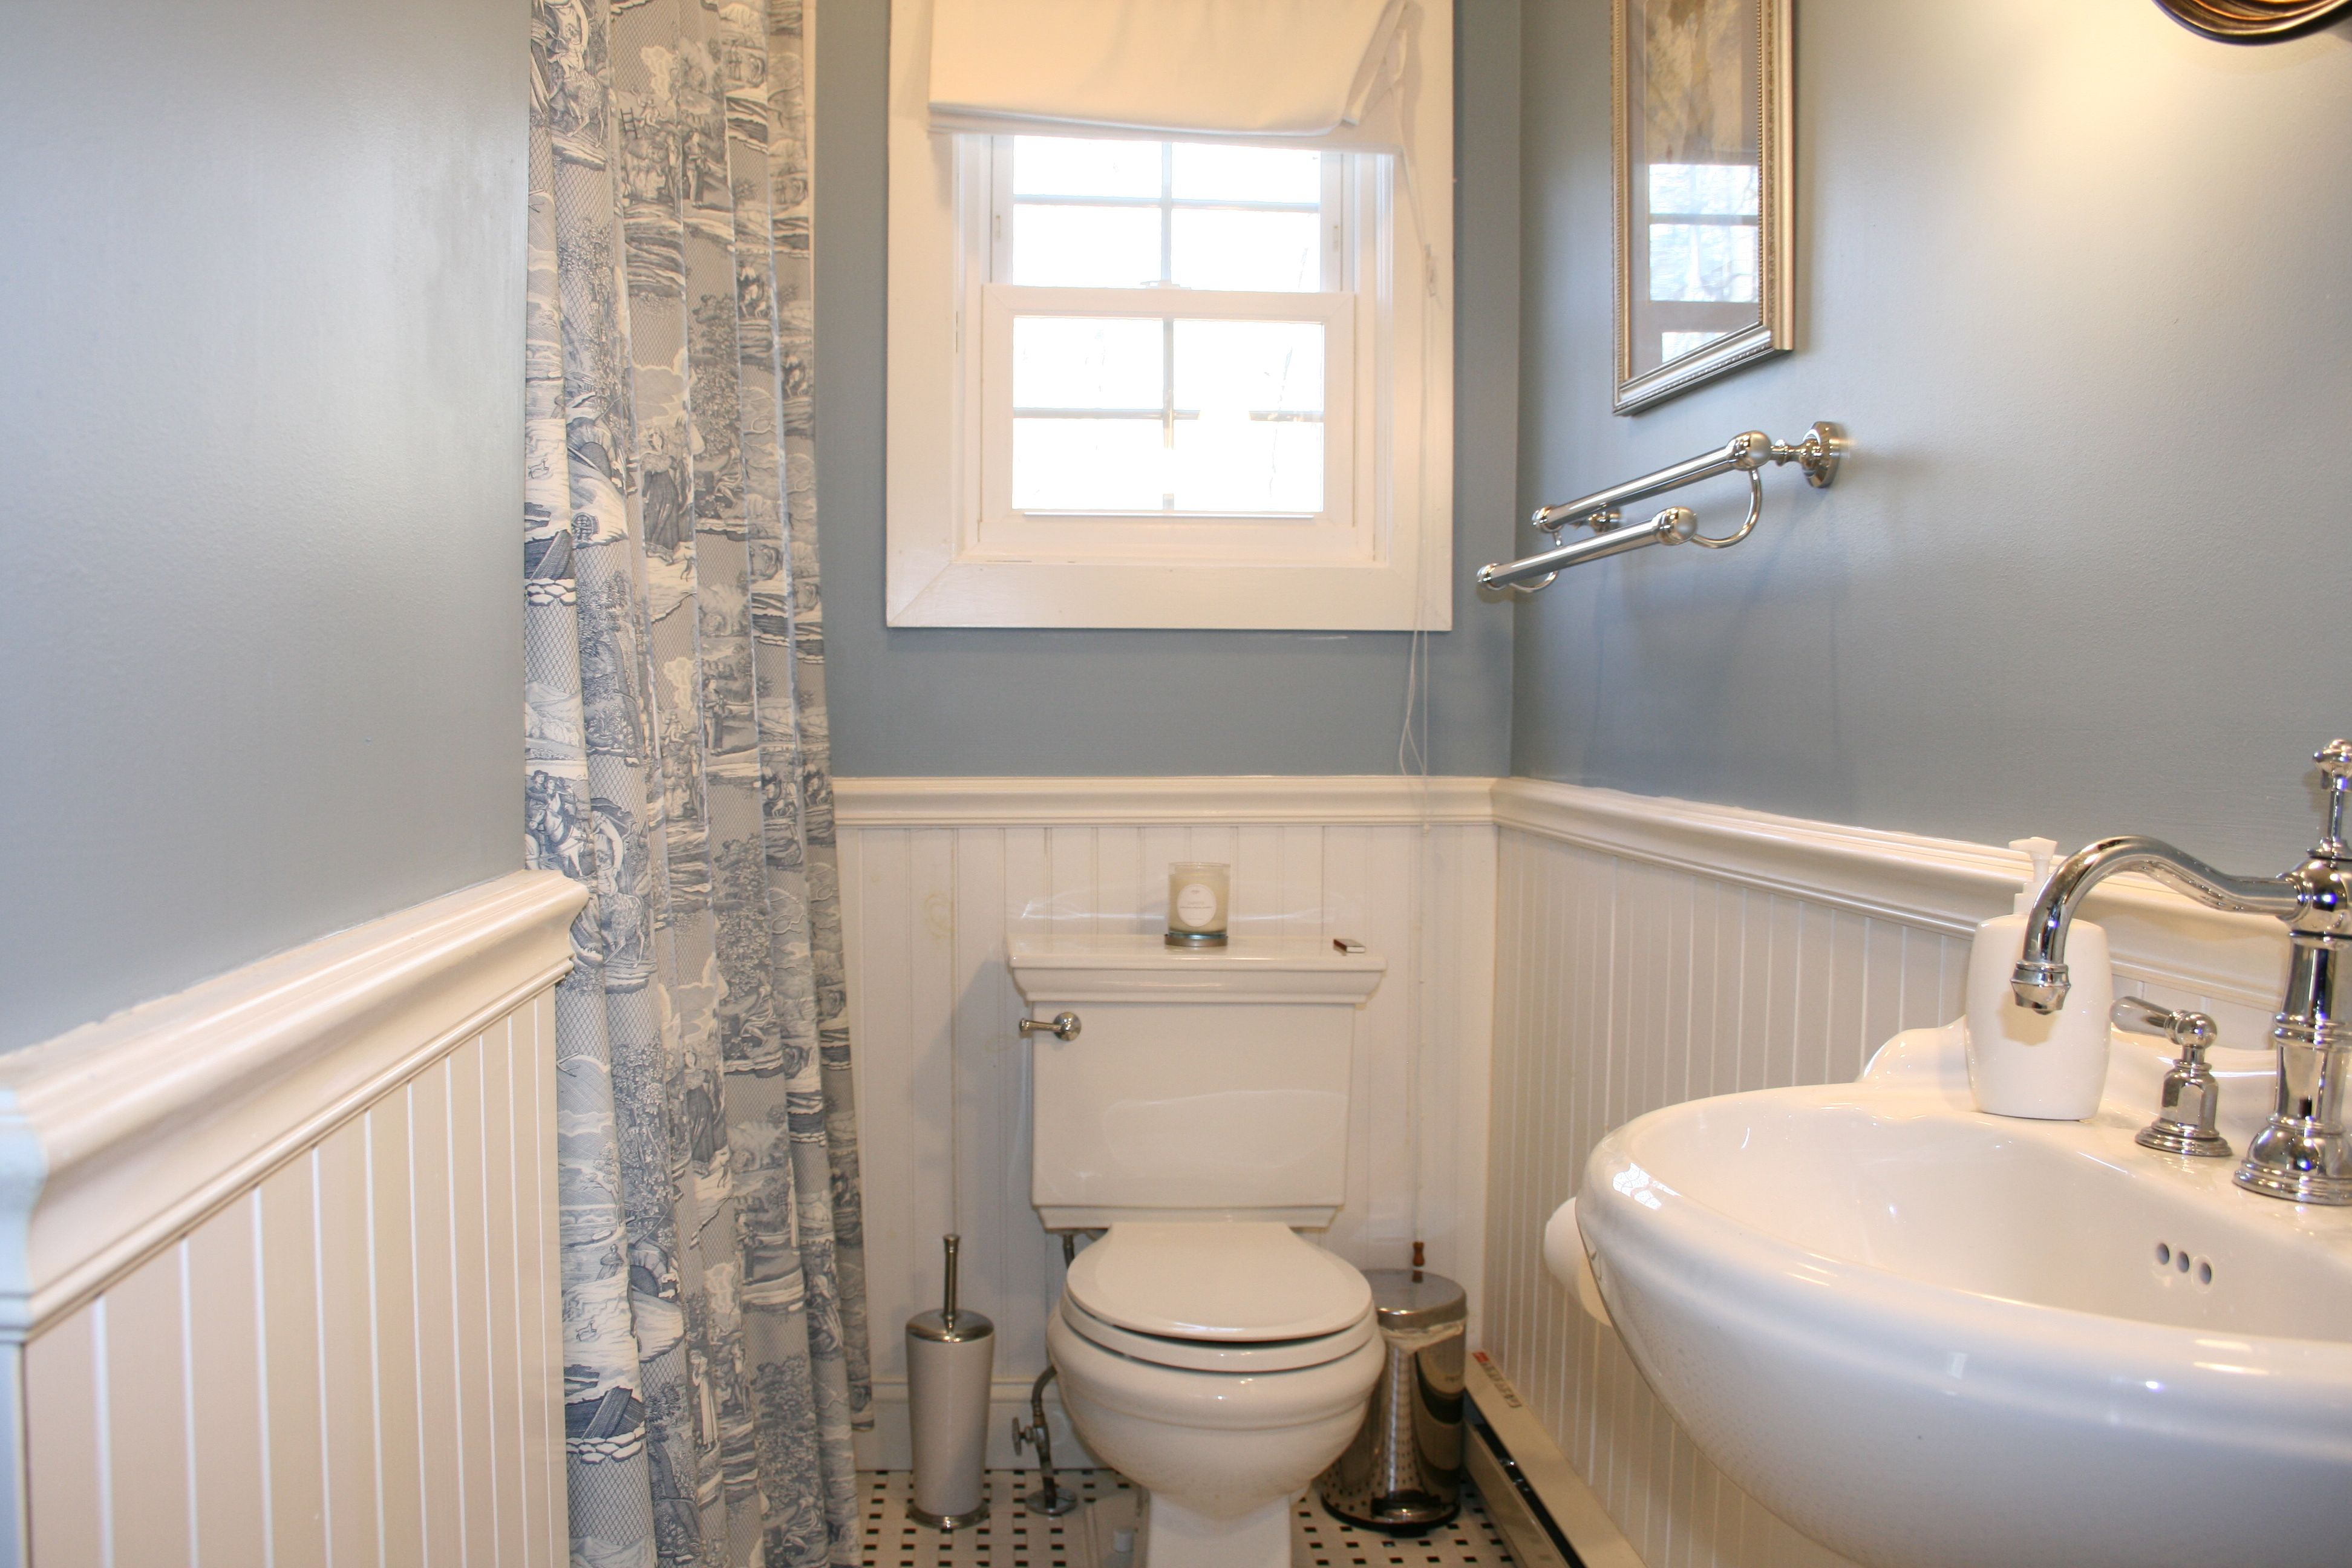 Toile Bathroom Ideas: Country Bathroom Post-renovation By Cathy Hobbs Design